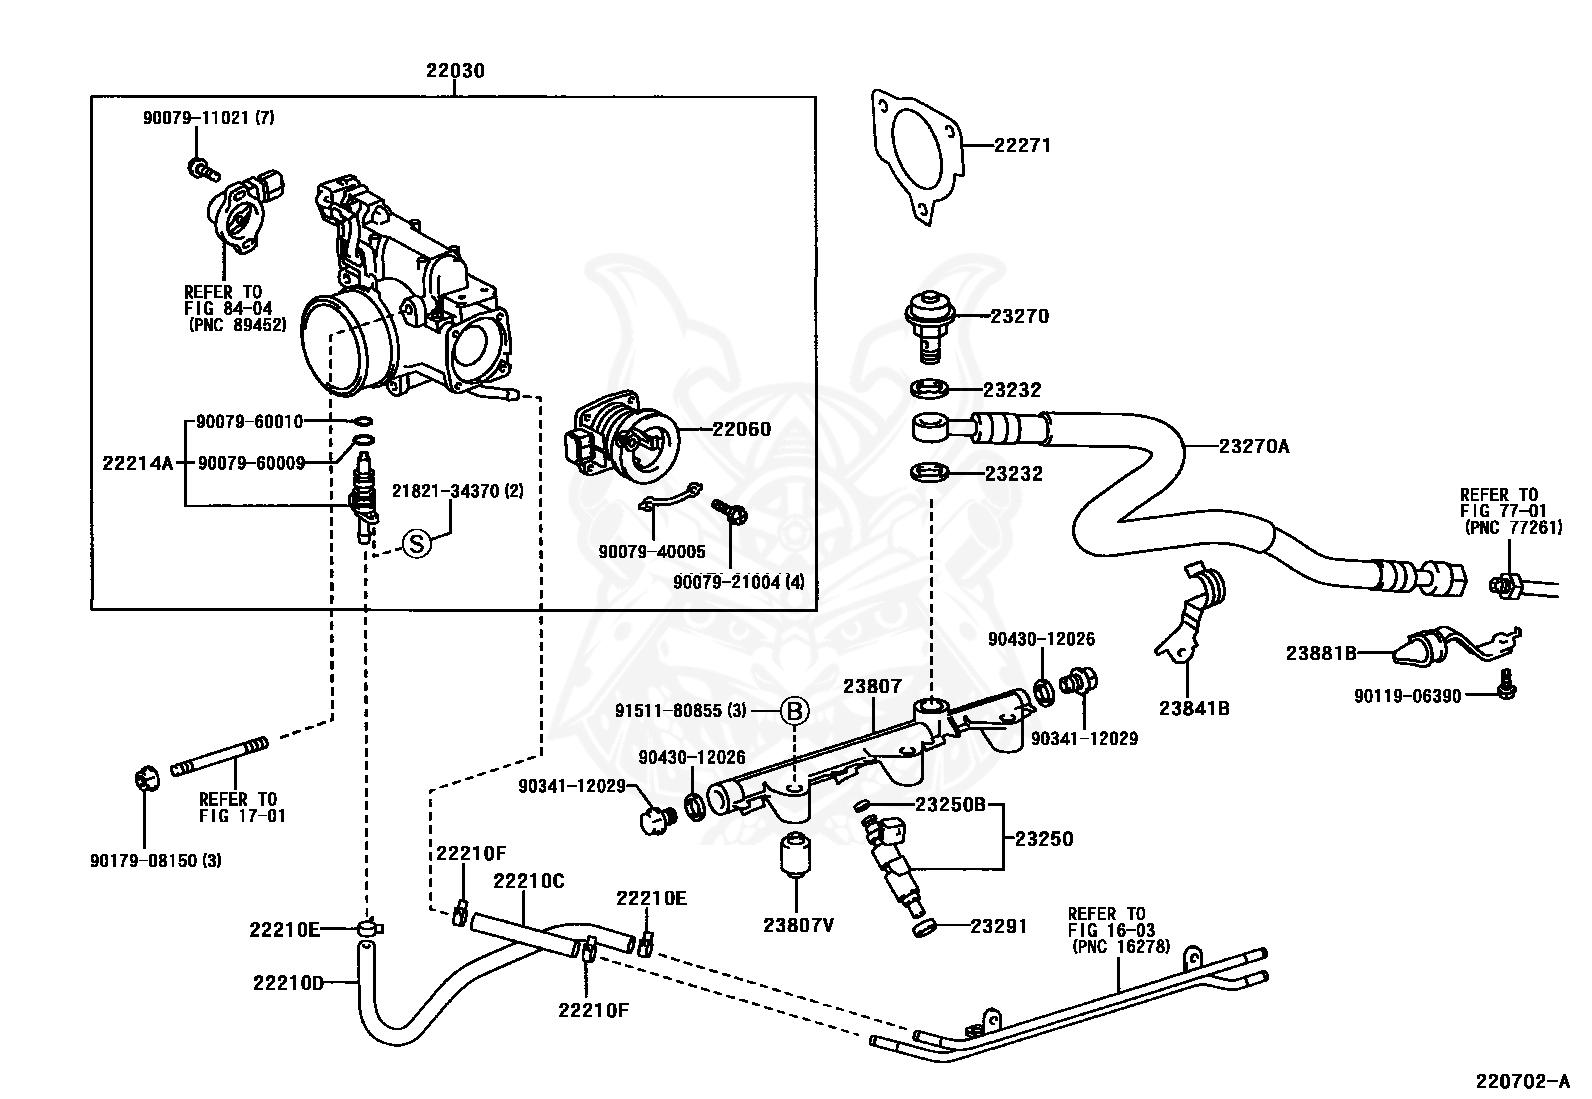 Daihatsu Fuel Pressure Diagram Kartonyonoprian 5 Rmnddesign Nl